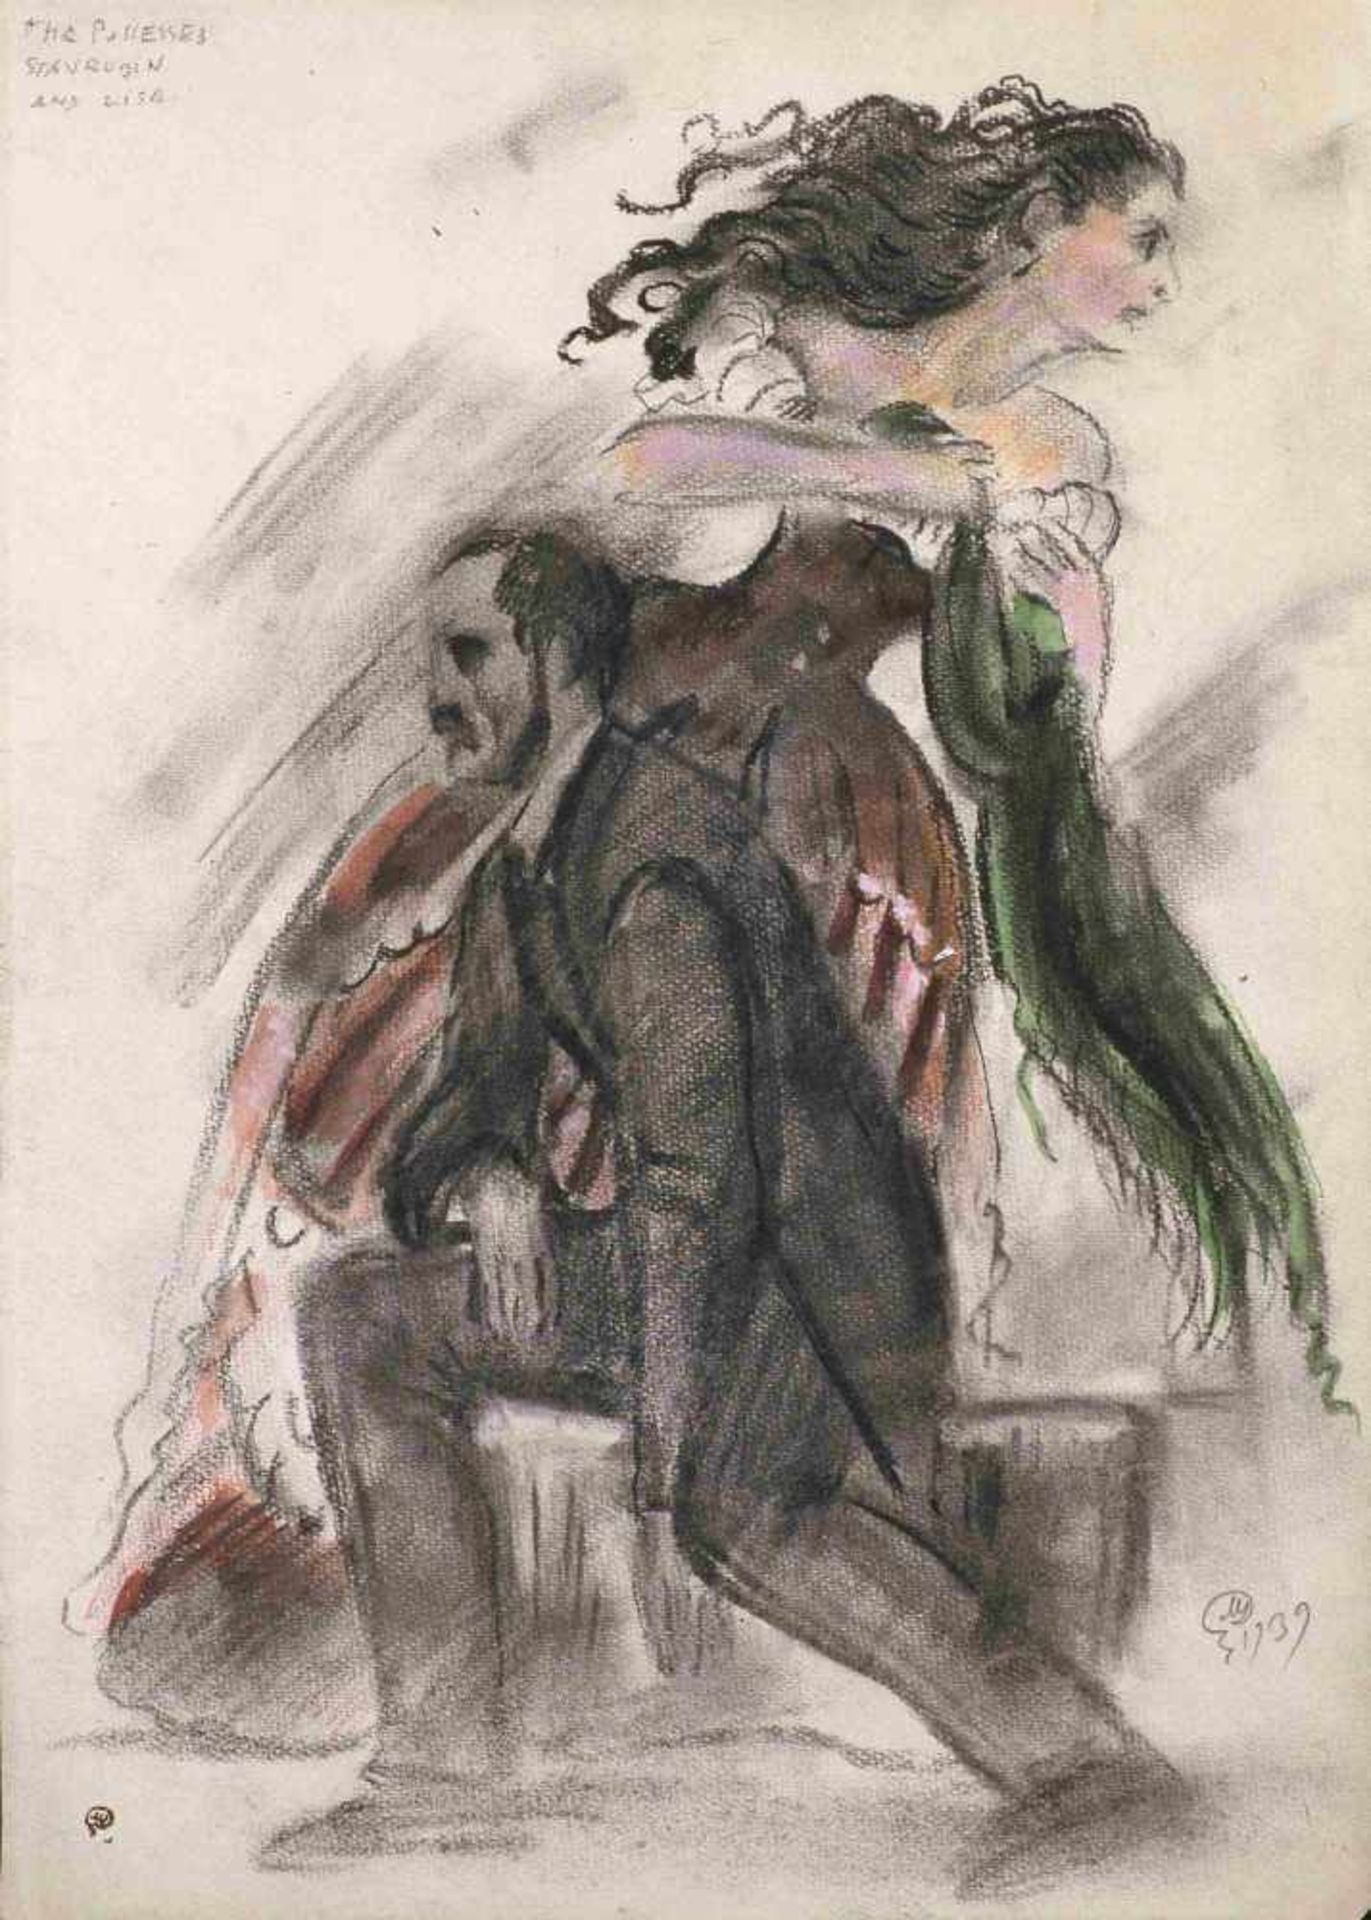 Mstislav Dobuzhinski (1875-1957) Kostümentwurf-Stavrogin und Lisa im Theaterstück Besessene (nach